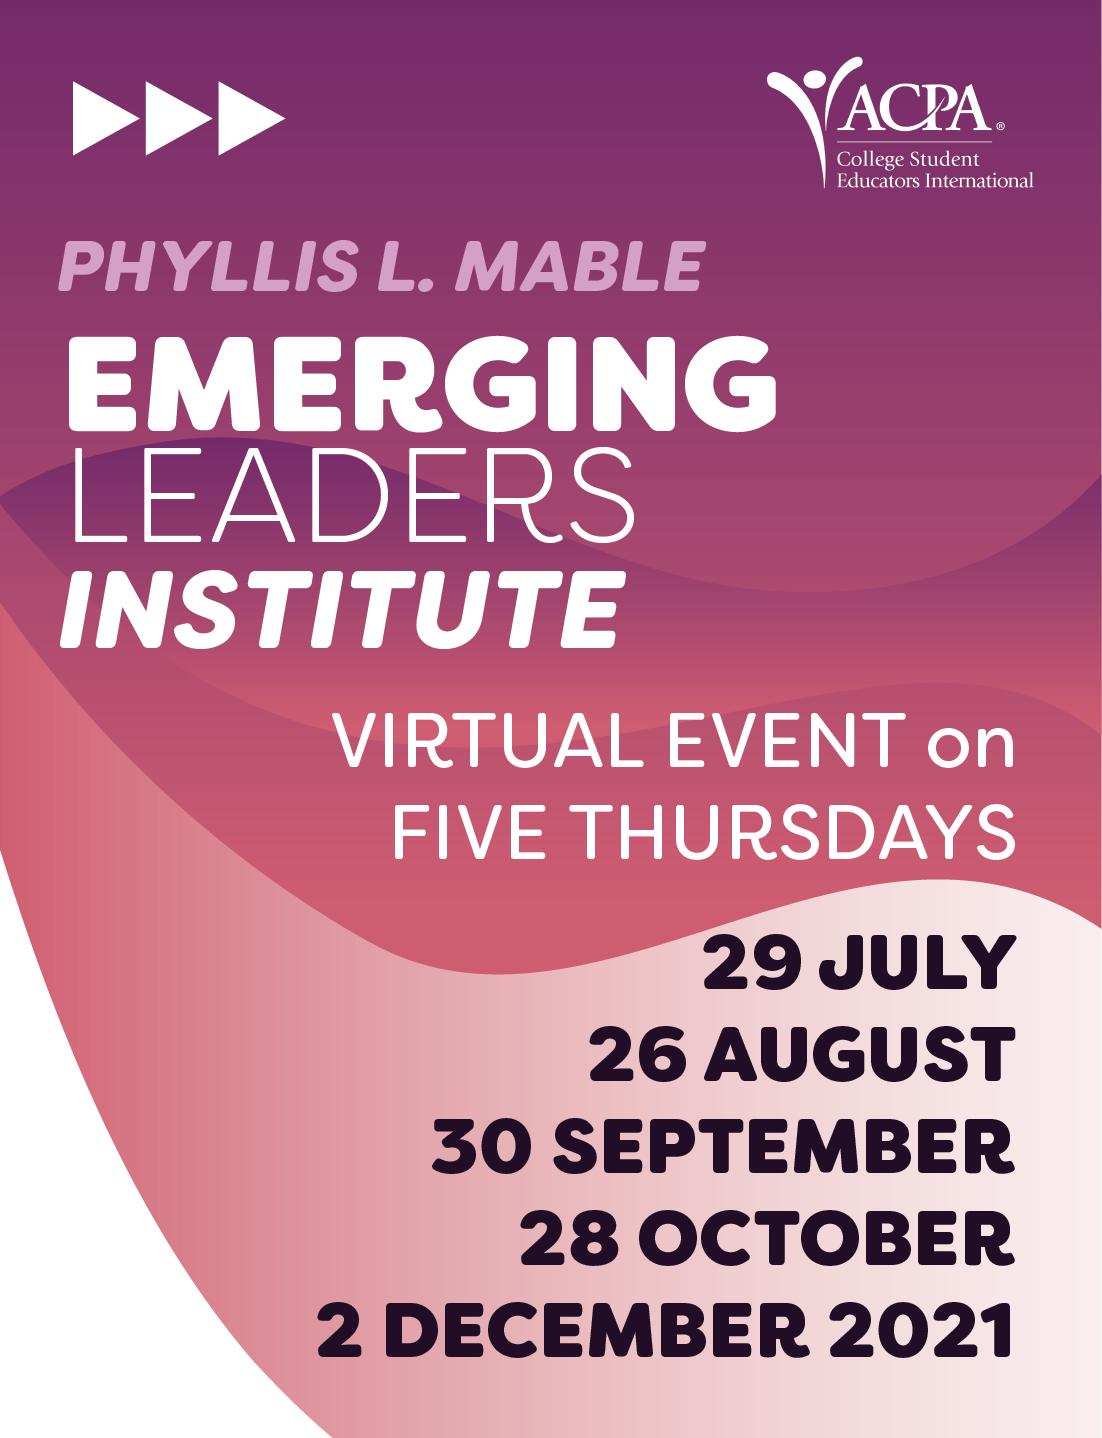 Phyllis L. Mabel Emerging Leaders Institute. Virtual Events on Five Thursdays. 29 July 26 August 30 September 28 October 2 December 2021